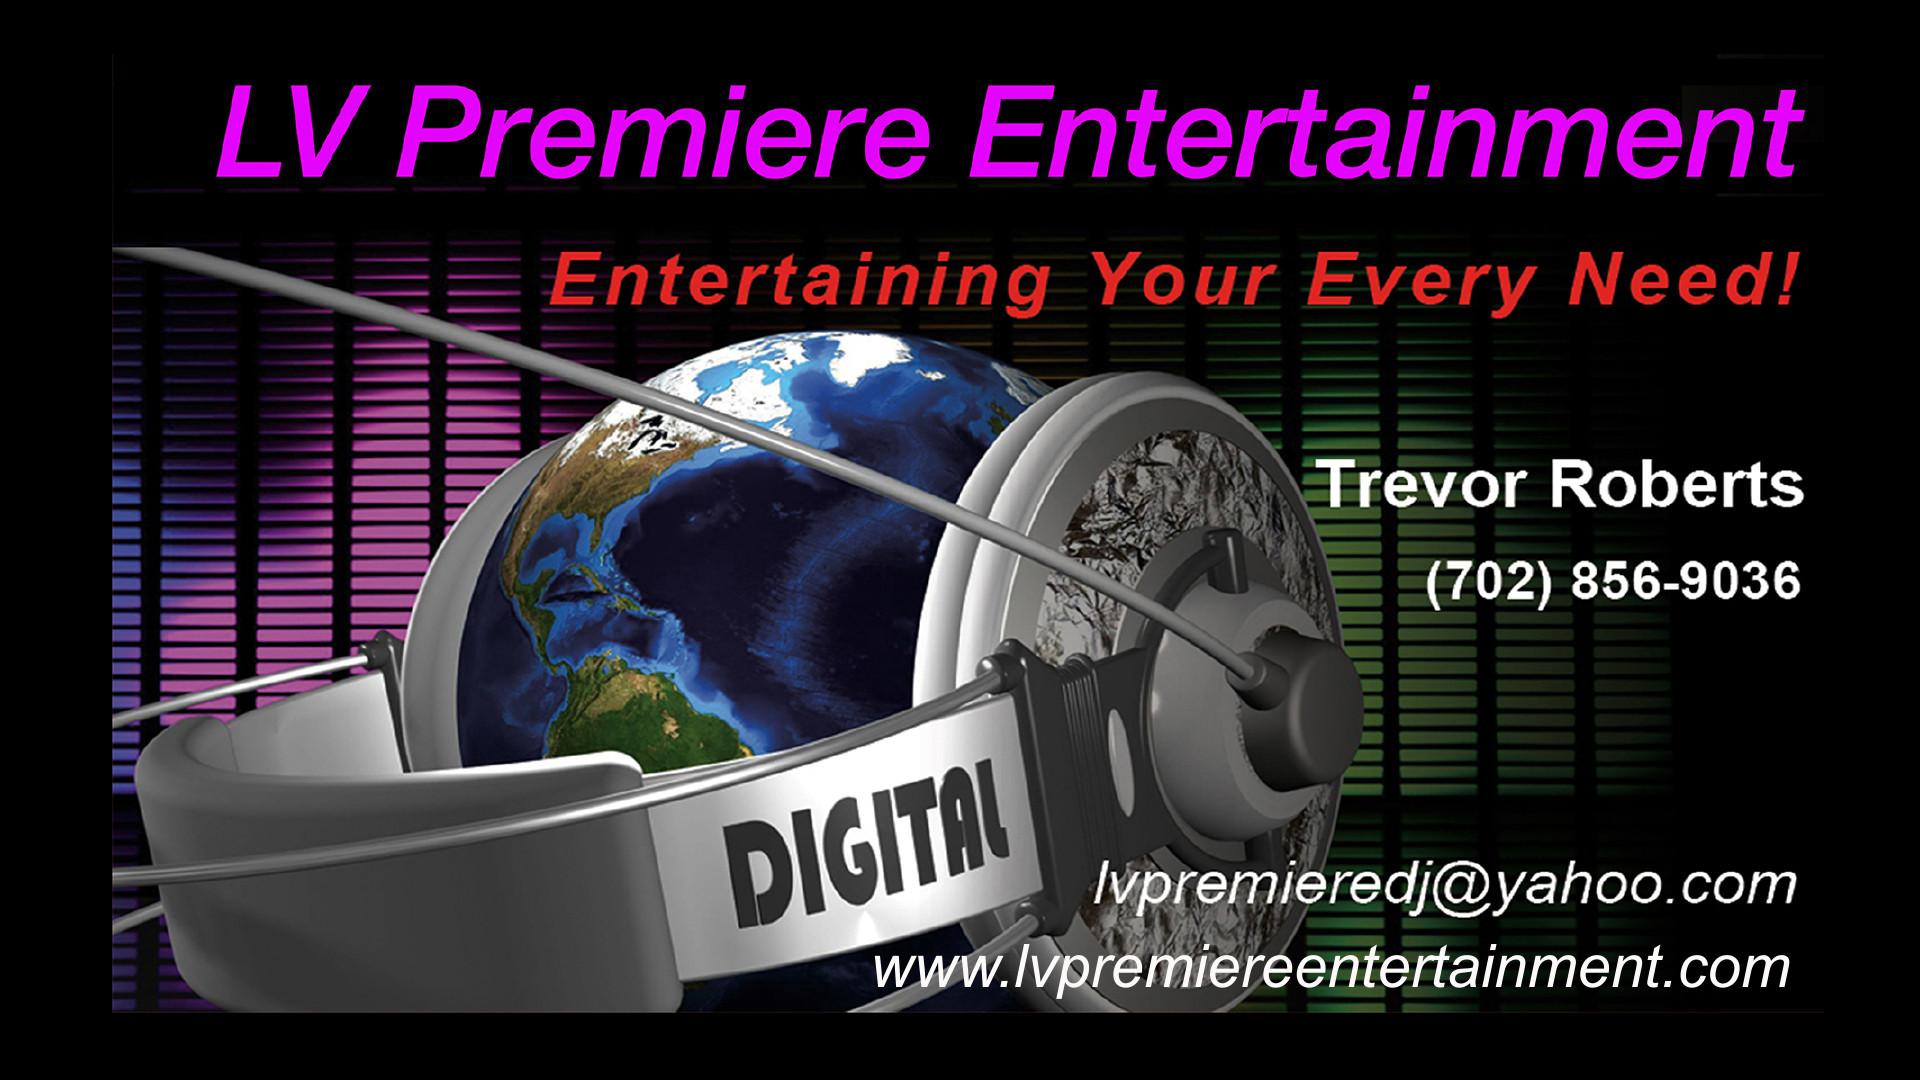 LV Premiere Entertainment Gift Card